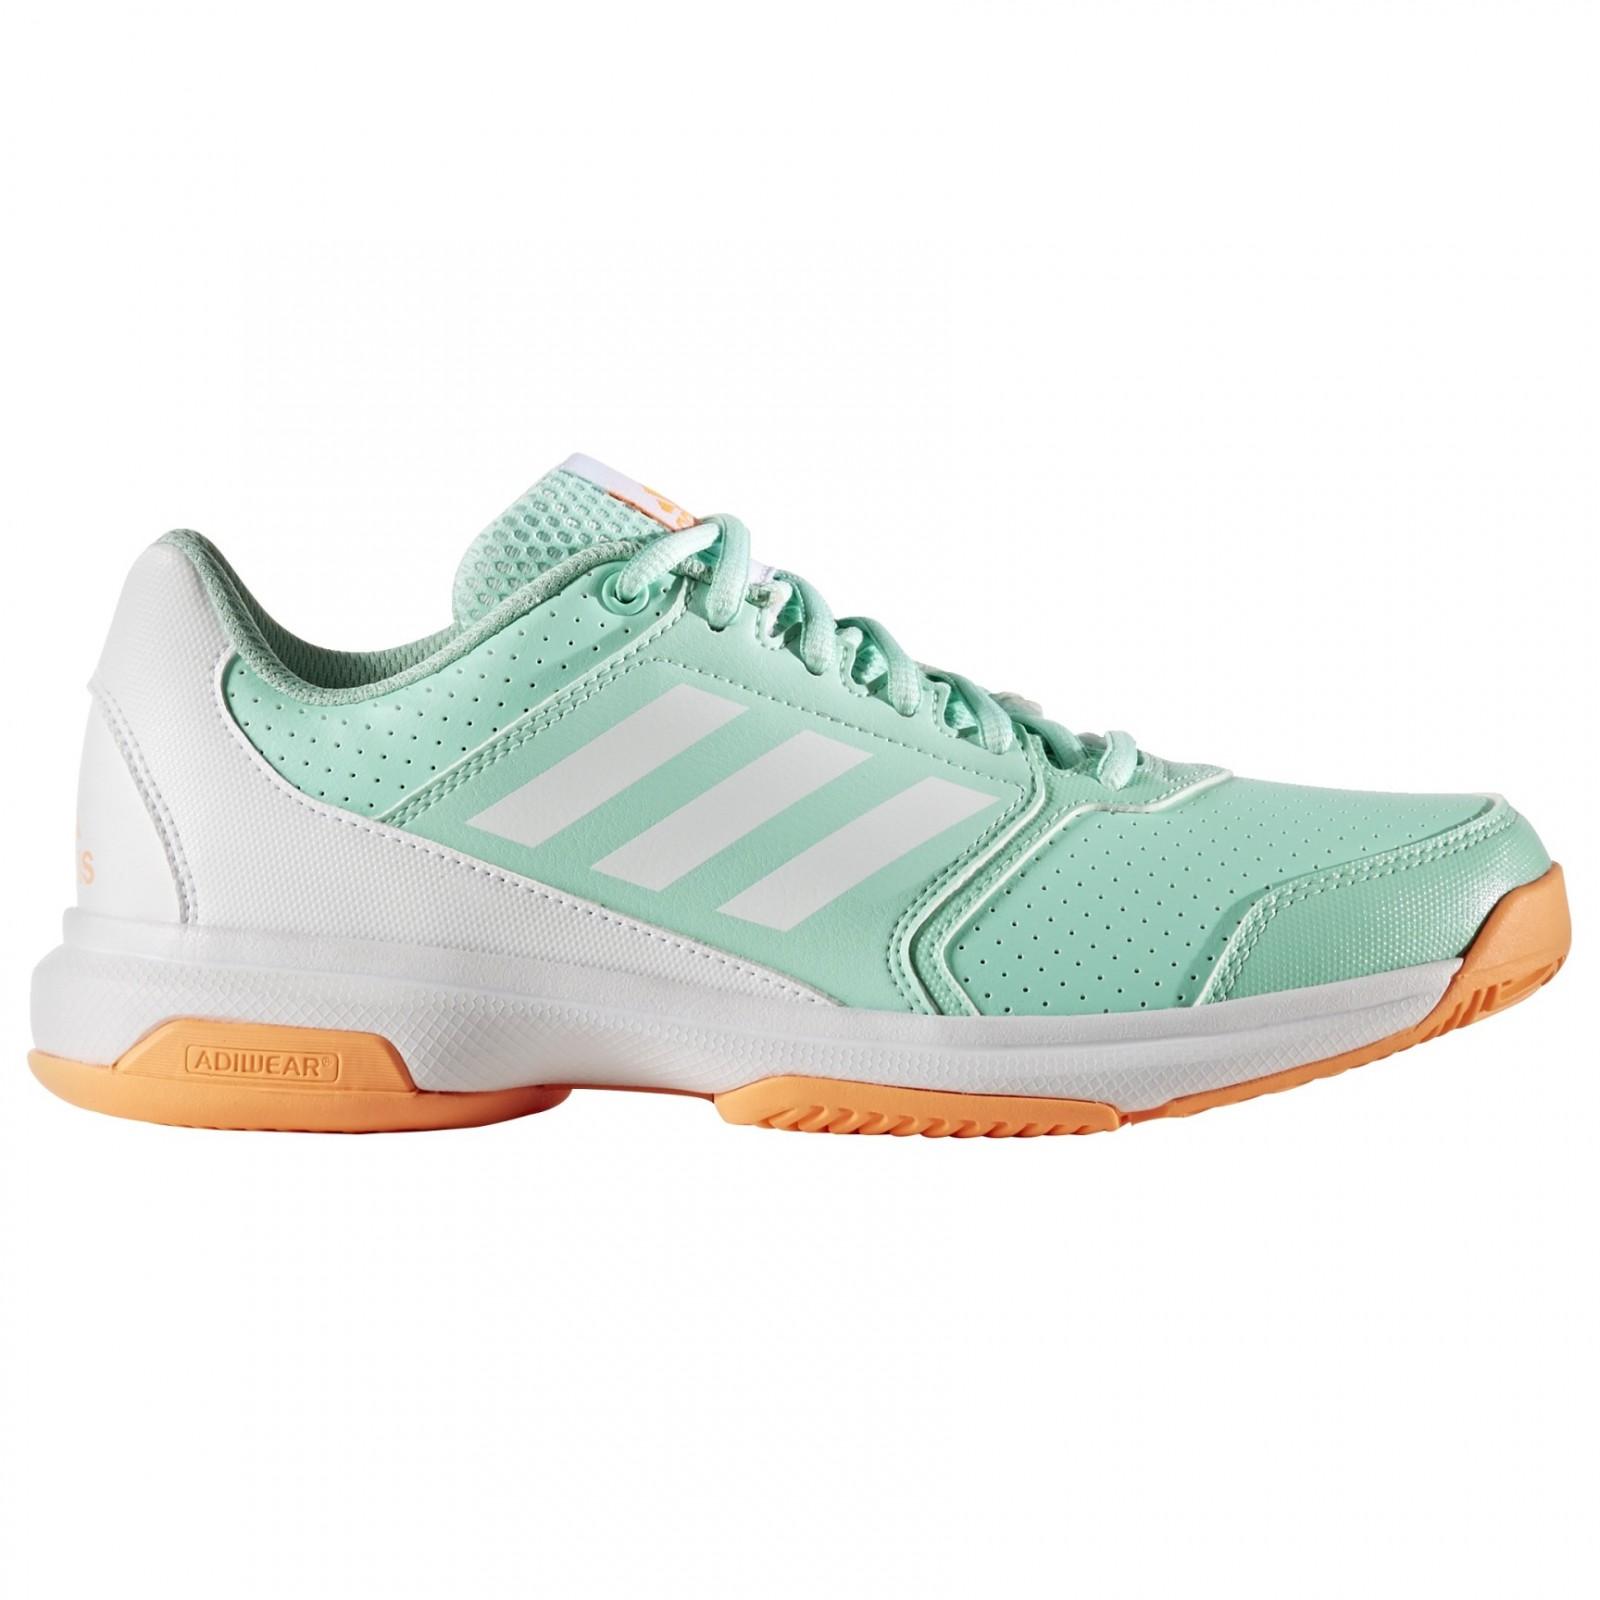 Dámské tenisové boty adidas adizero attack w  3a33f286f9